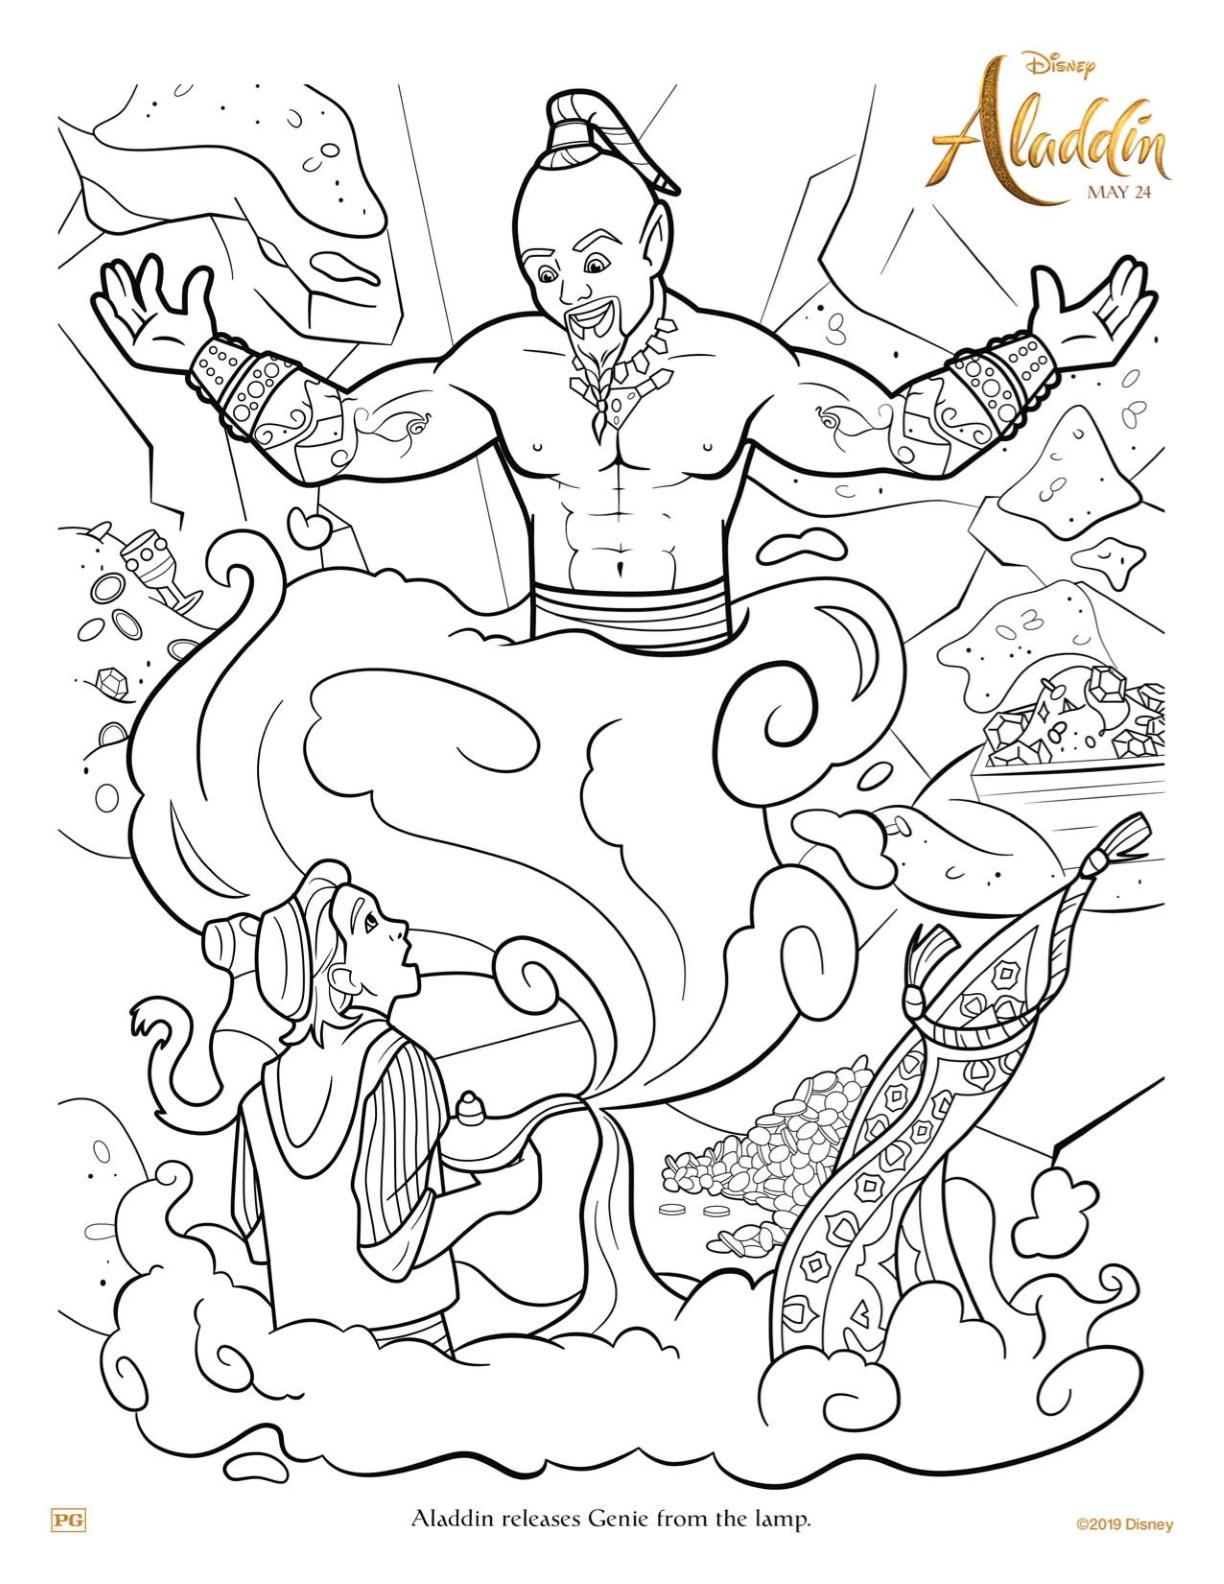 Free Printable Disney Aladdin and Genie Coloring Page #aladdin #disney #freeprintable #genie #willsmith #coloringpage